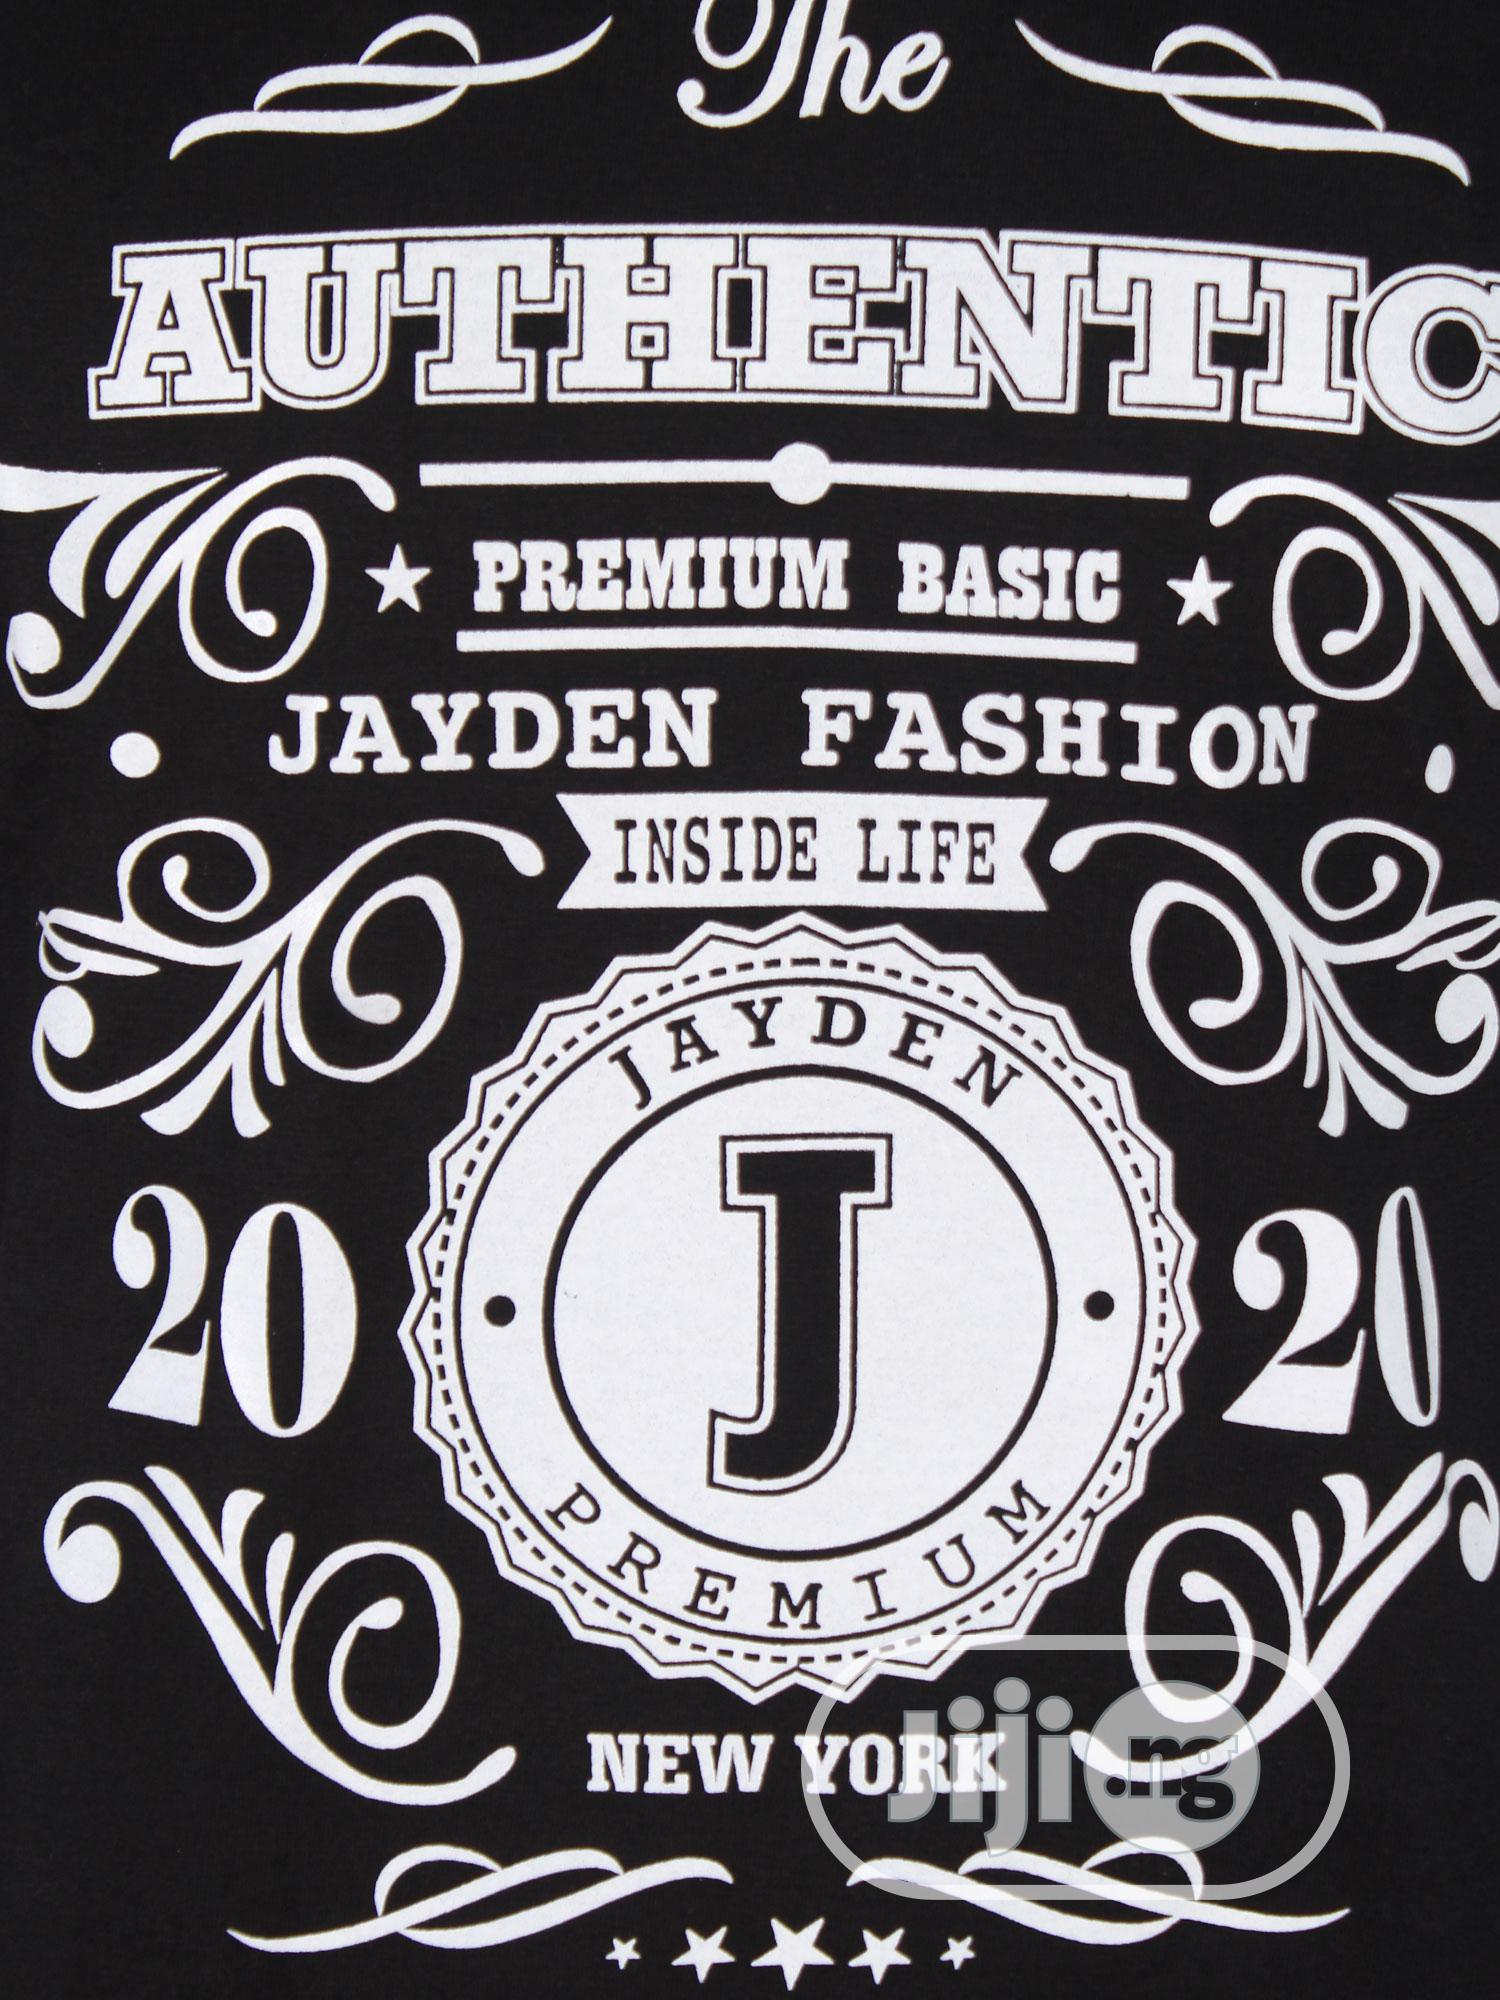 Jayden Apparelkare Printed T-Shirt Black   Clothing for sale in Surulere, Lagos State, Nigeria